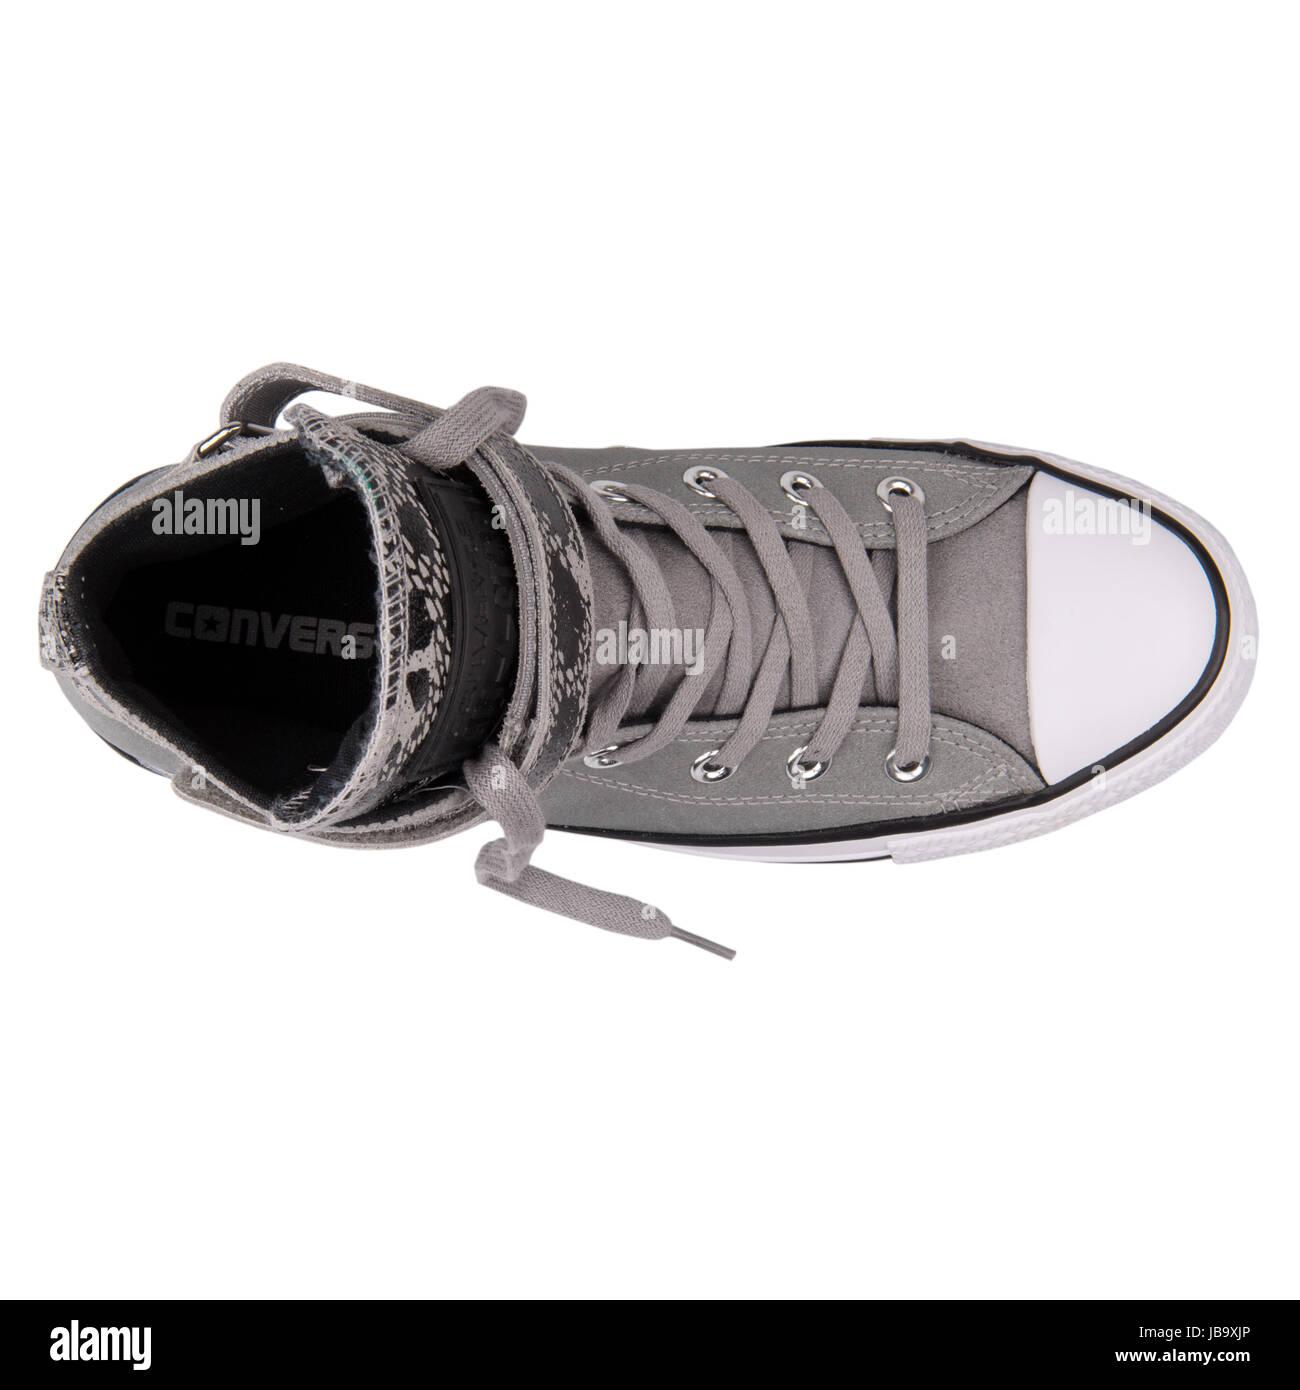 Converse Chuck Taylor All Star Brea Hi Dolphin Black Women s Shoes -  549581C - Stock Image c7adaa812